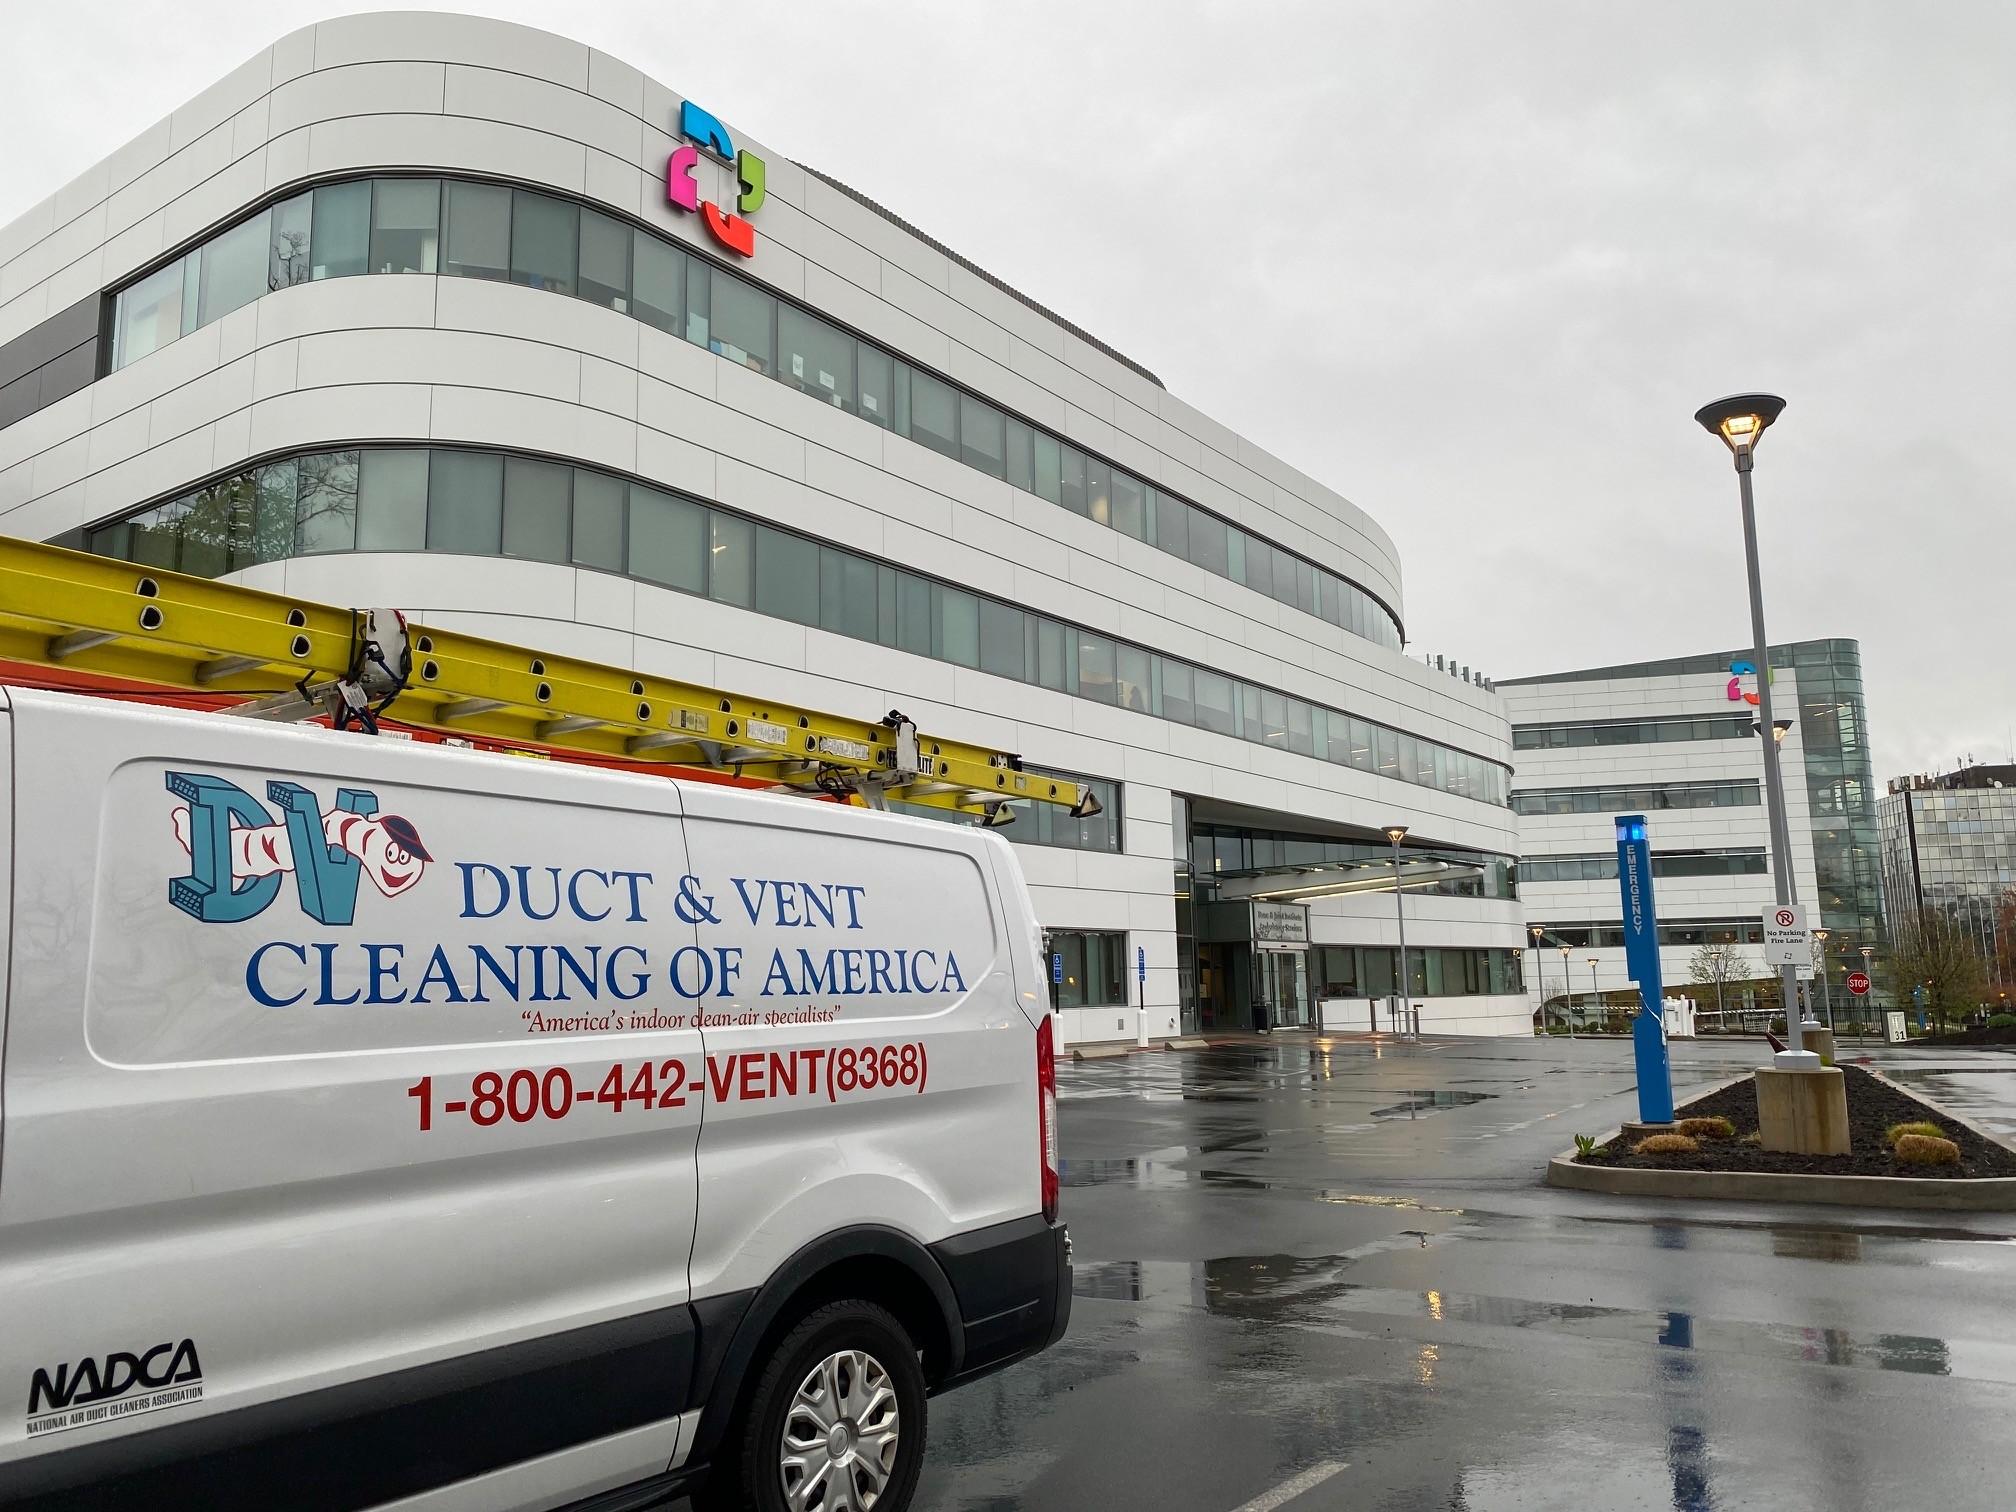 Hartford Surgery Center – Hartford CT image0.jpg